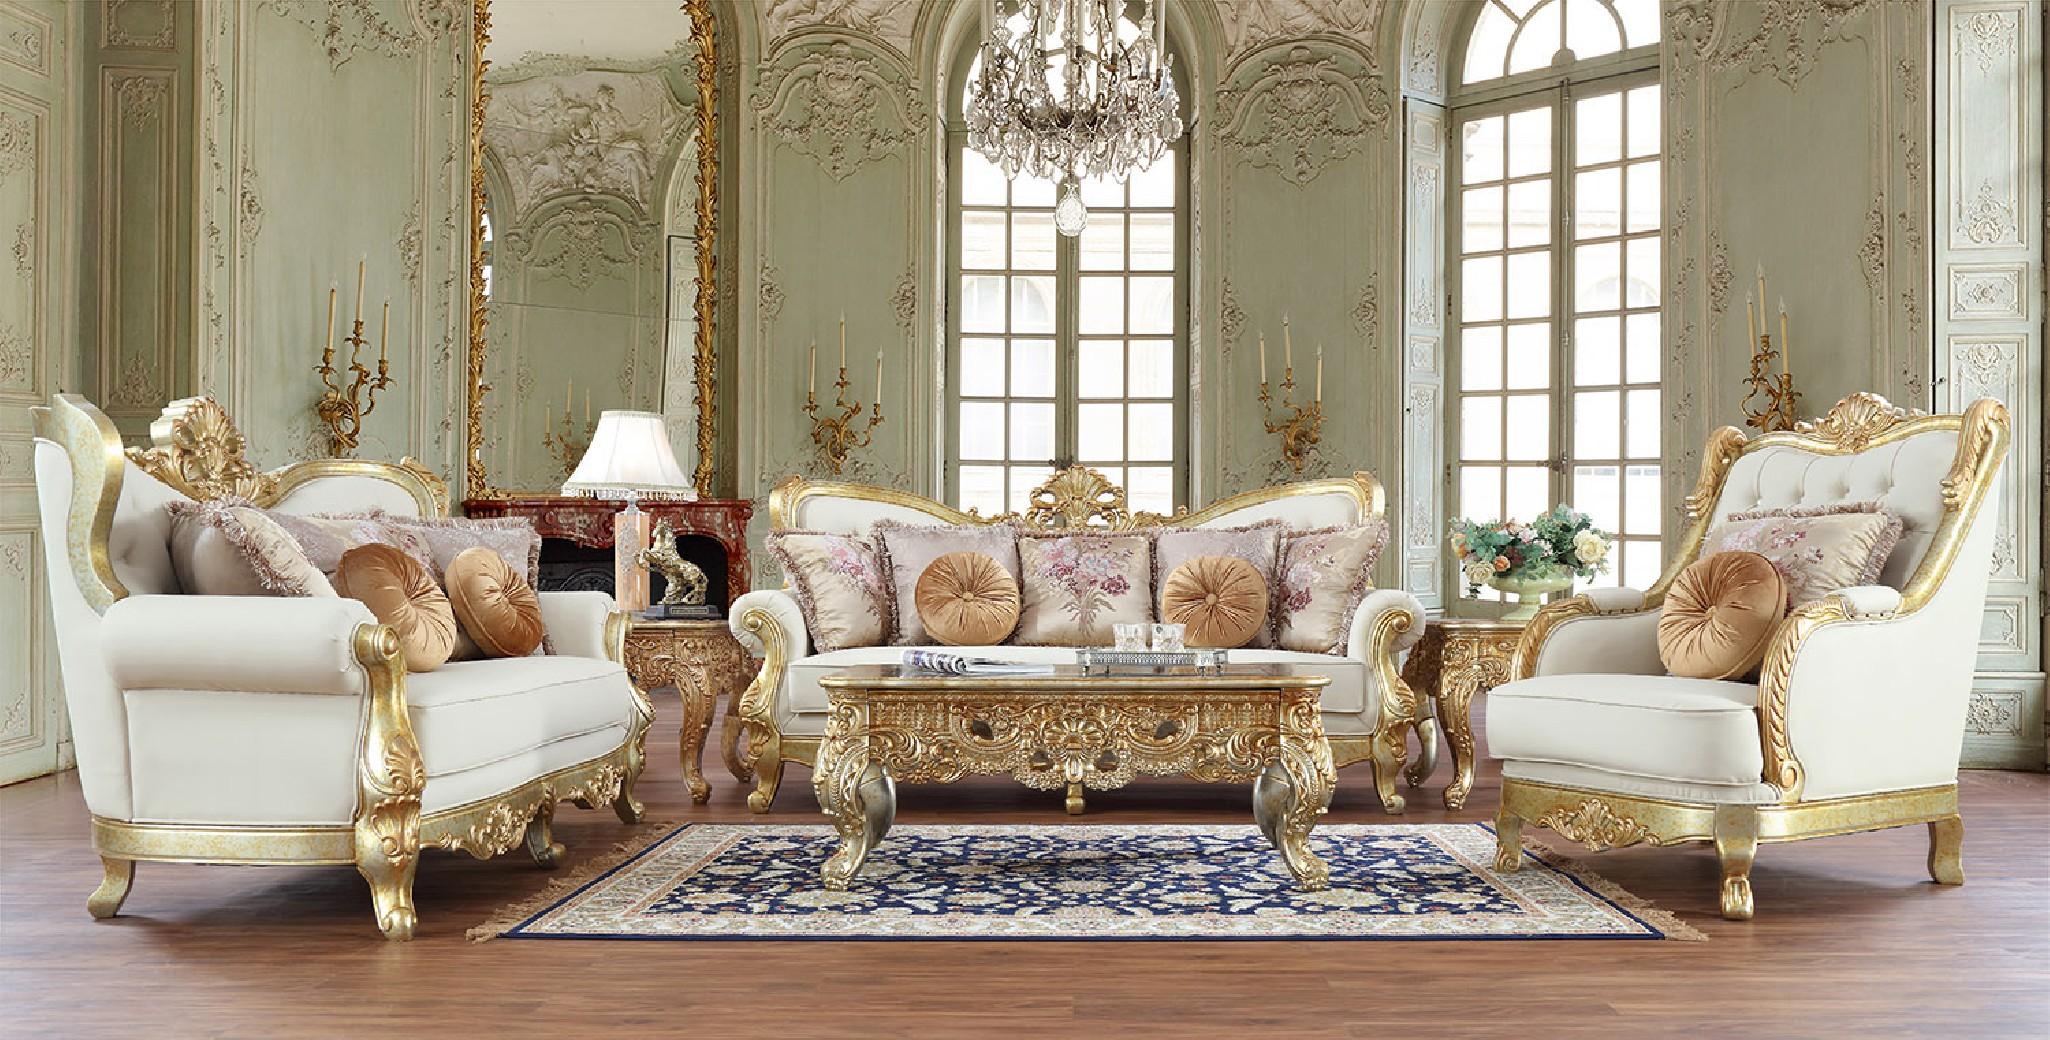 Hd 93630 Homey Design Living Room Set, Victorian Living Room Set